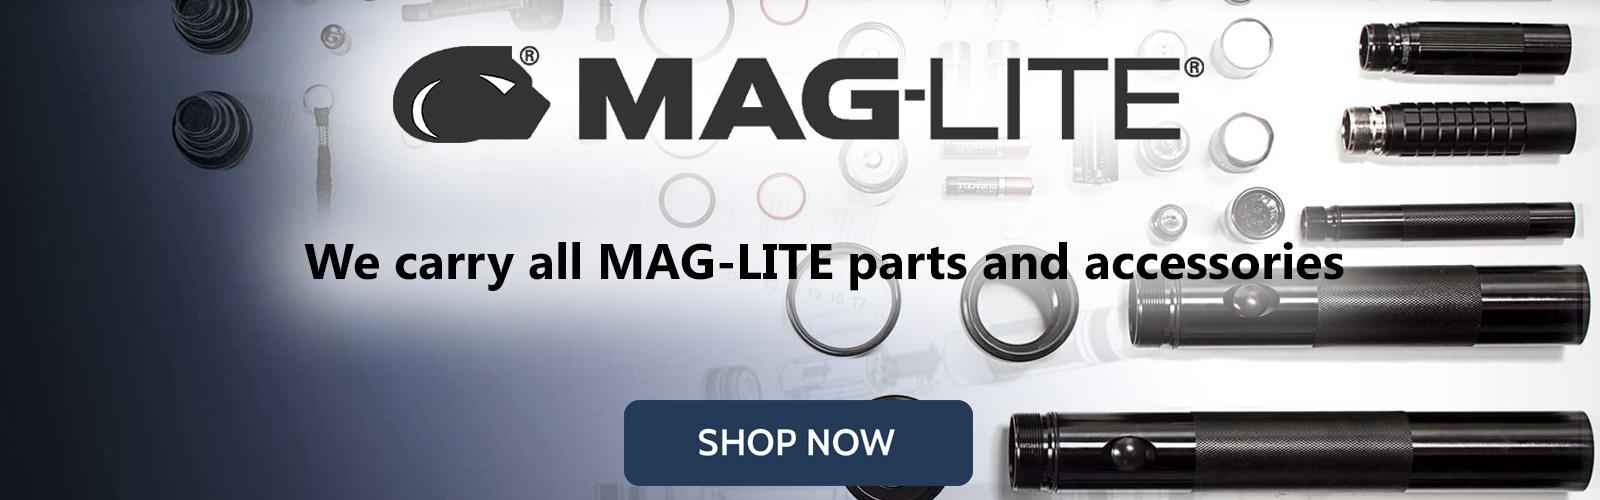 Shop Mag-Lite Parts